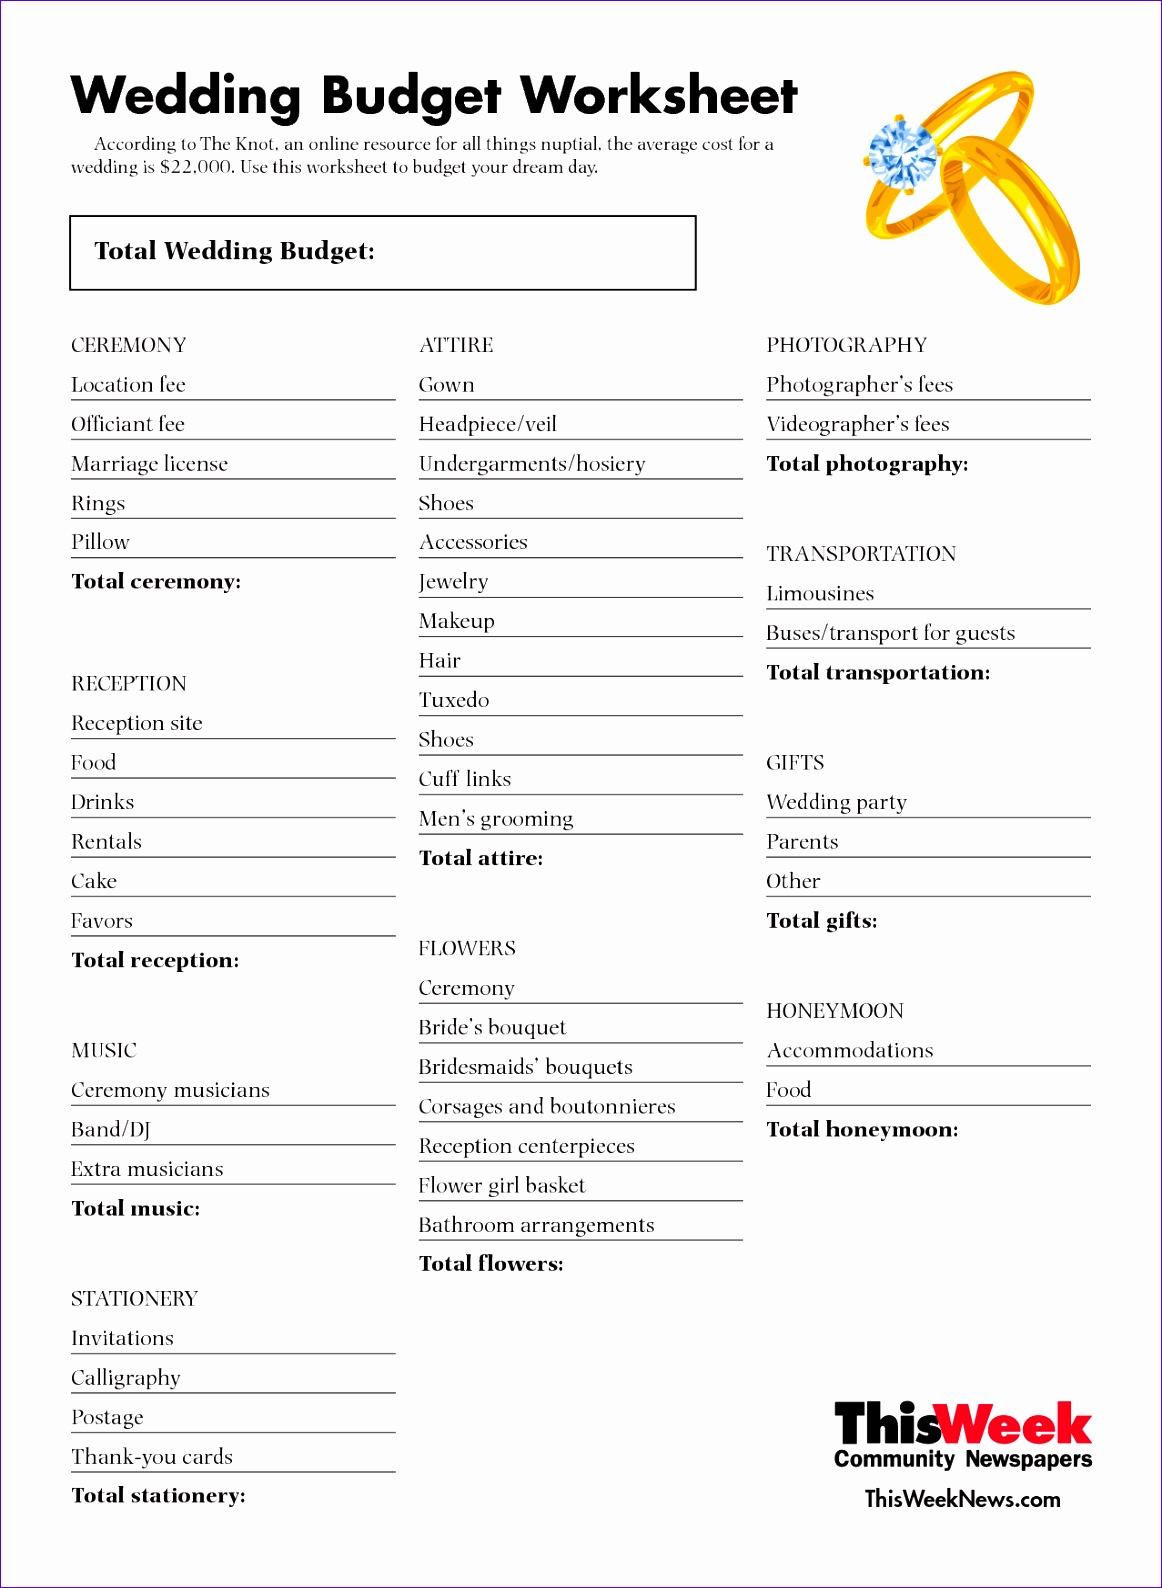 10 Wedding Vendor List Template Excel